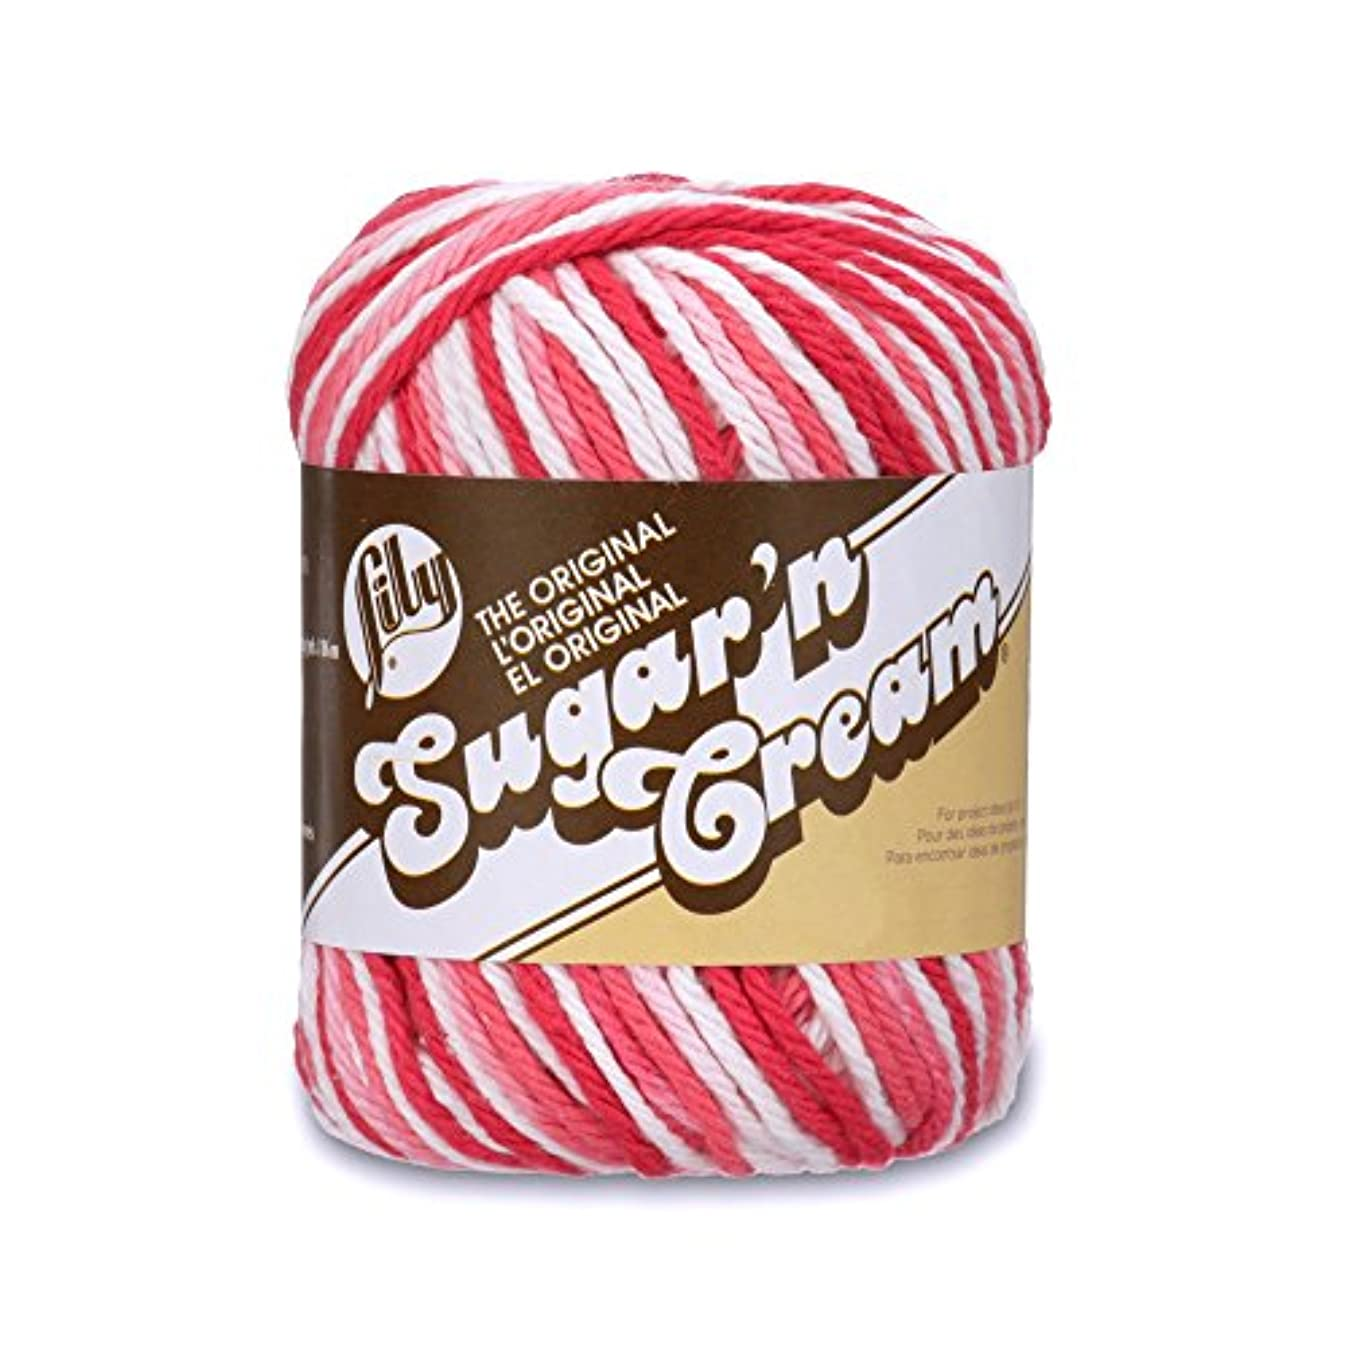 Lily Sugar 'N Cream The Original  Yarn (4) Medium Worsted Gauge 100% Cotton - 2 oz - Pink Ombre - Machine Wash & Dry